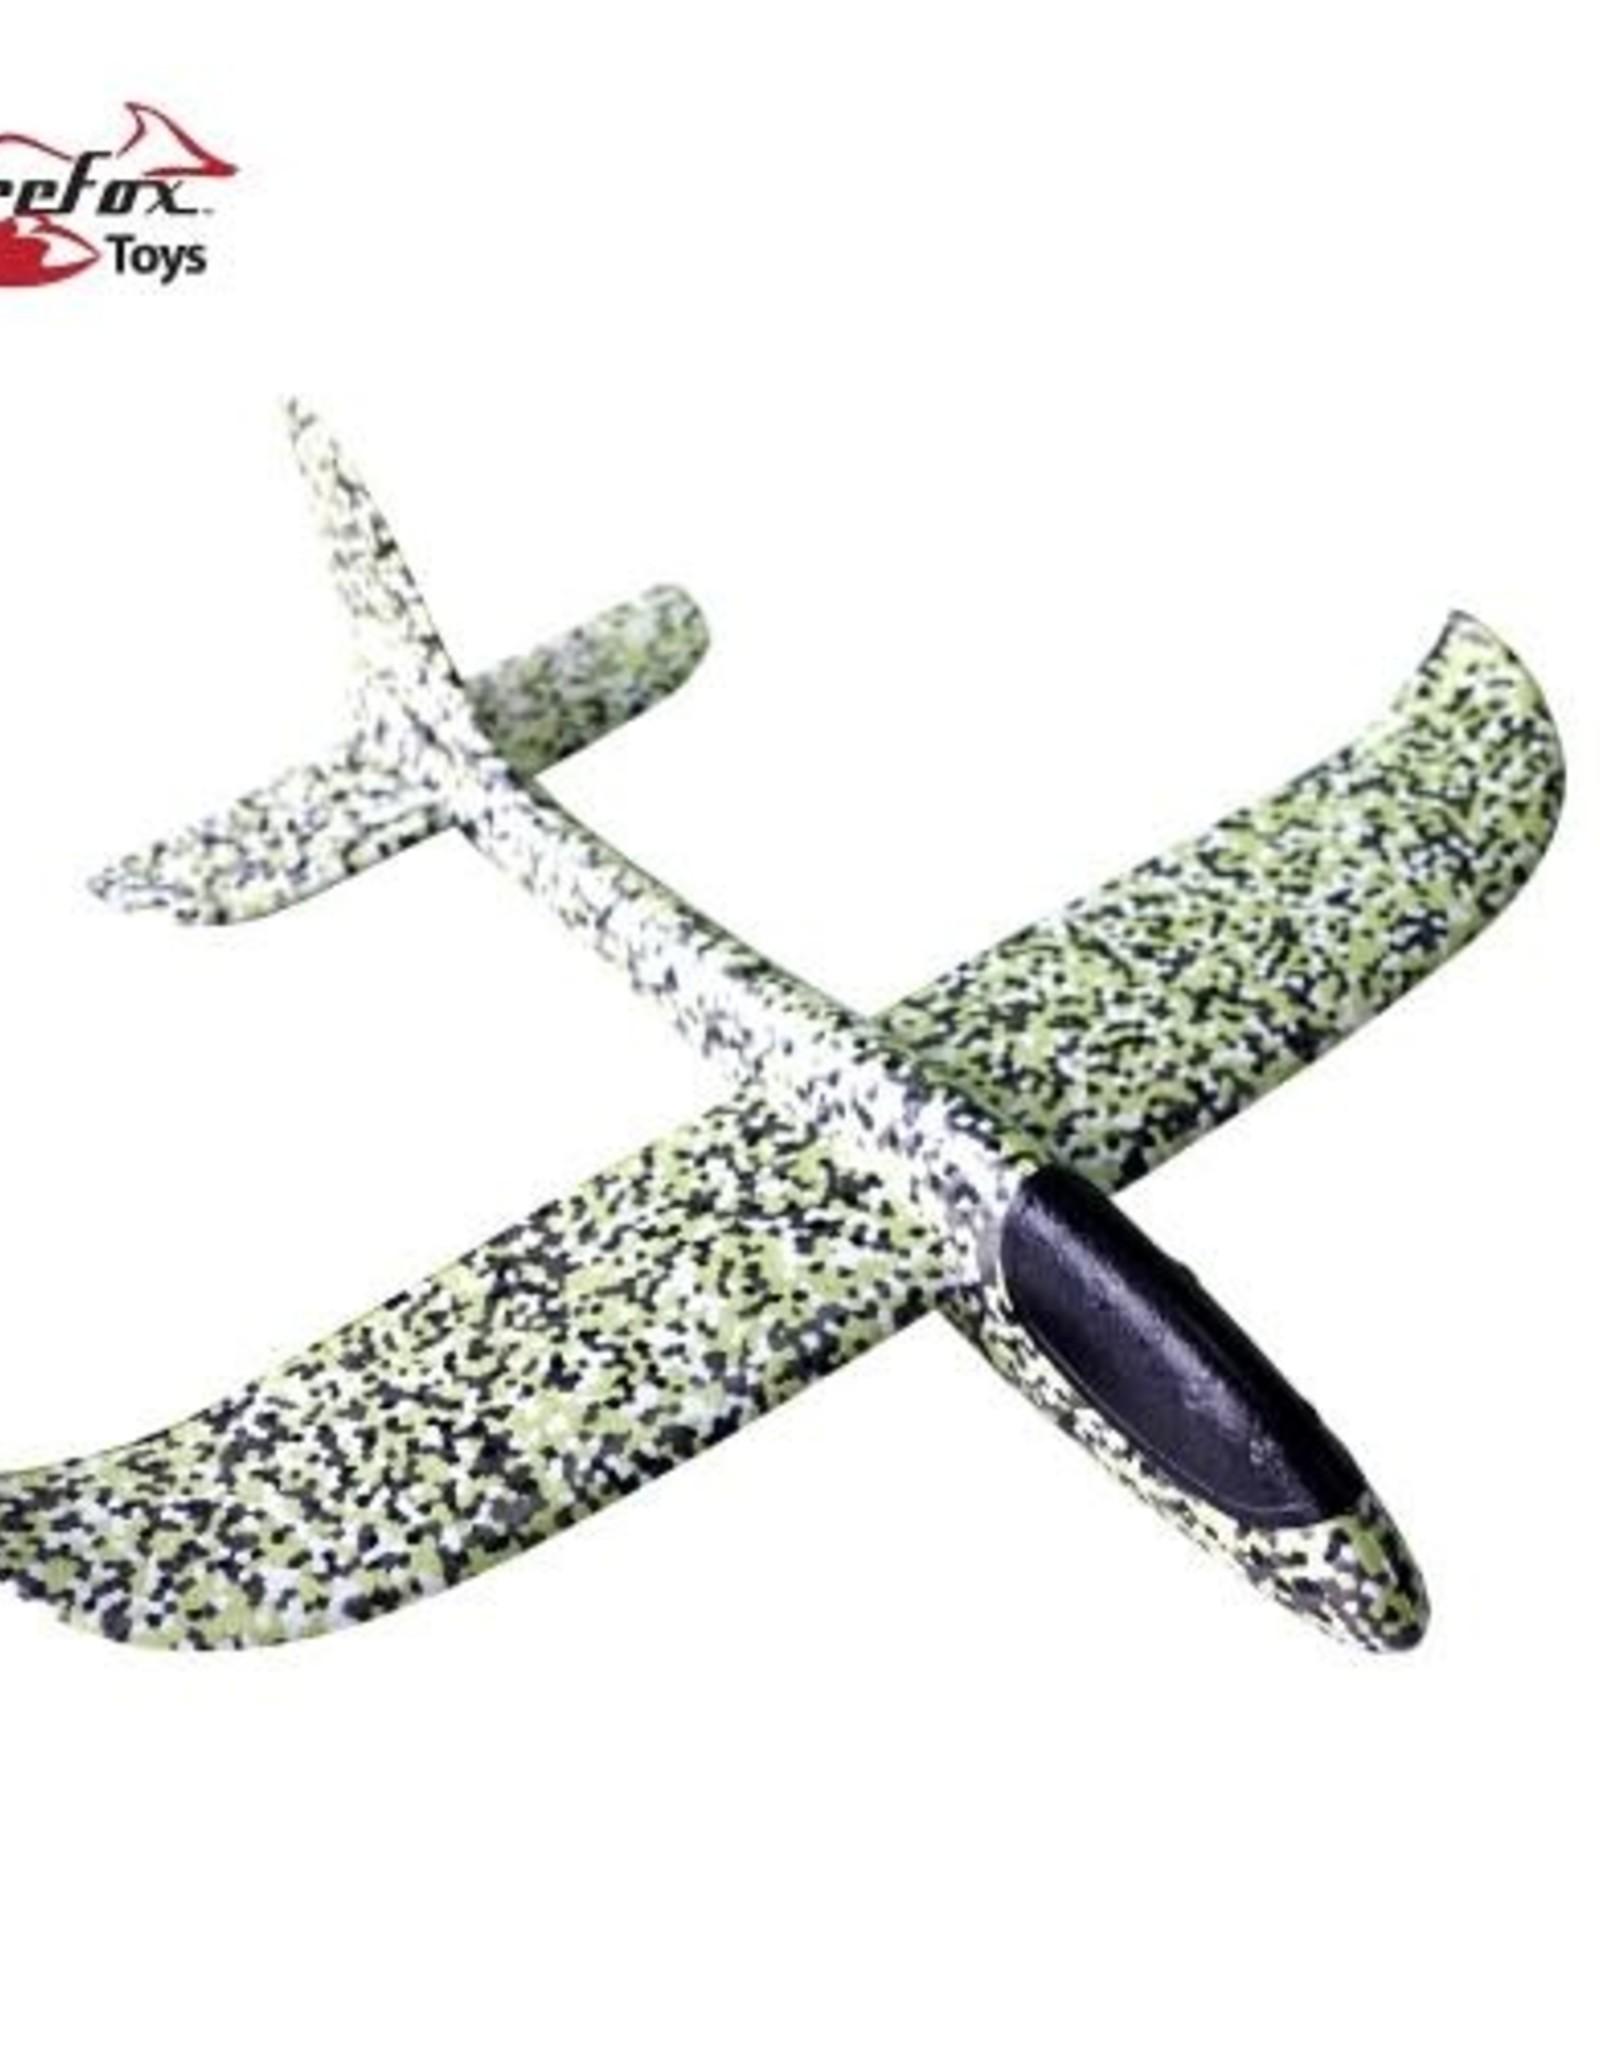 FireFox Toys Trixter Glider